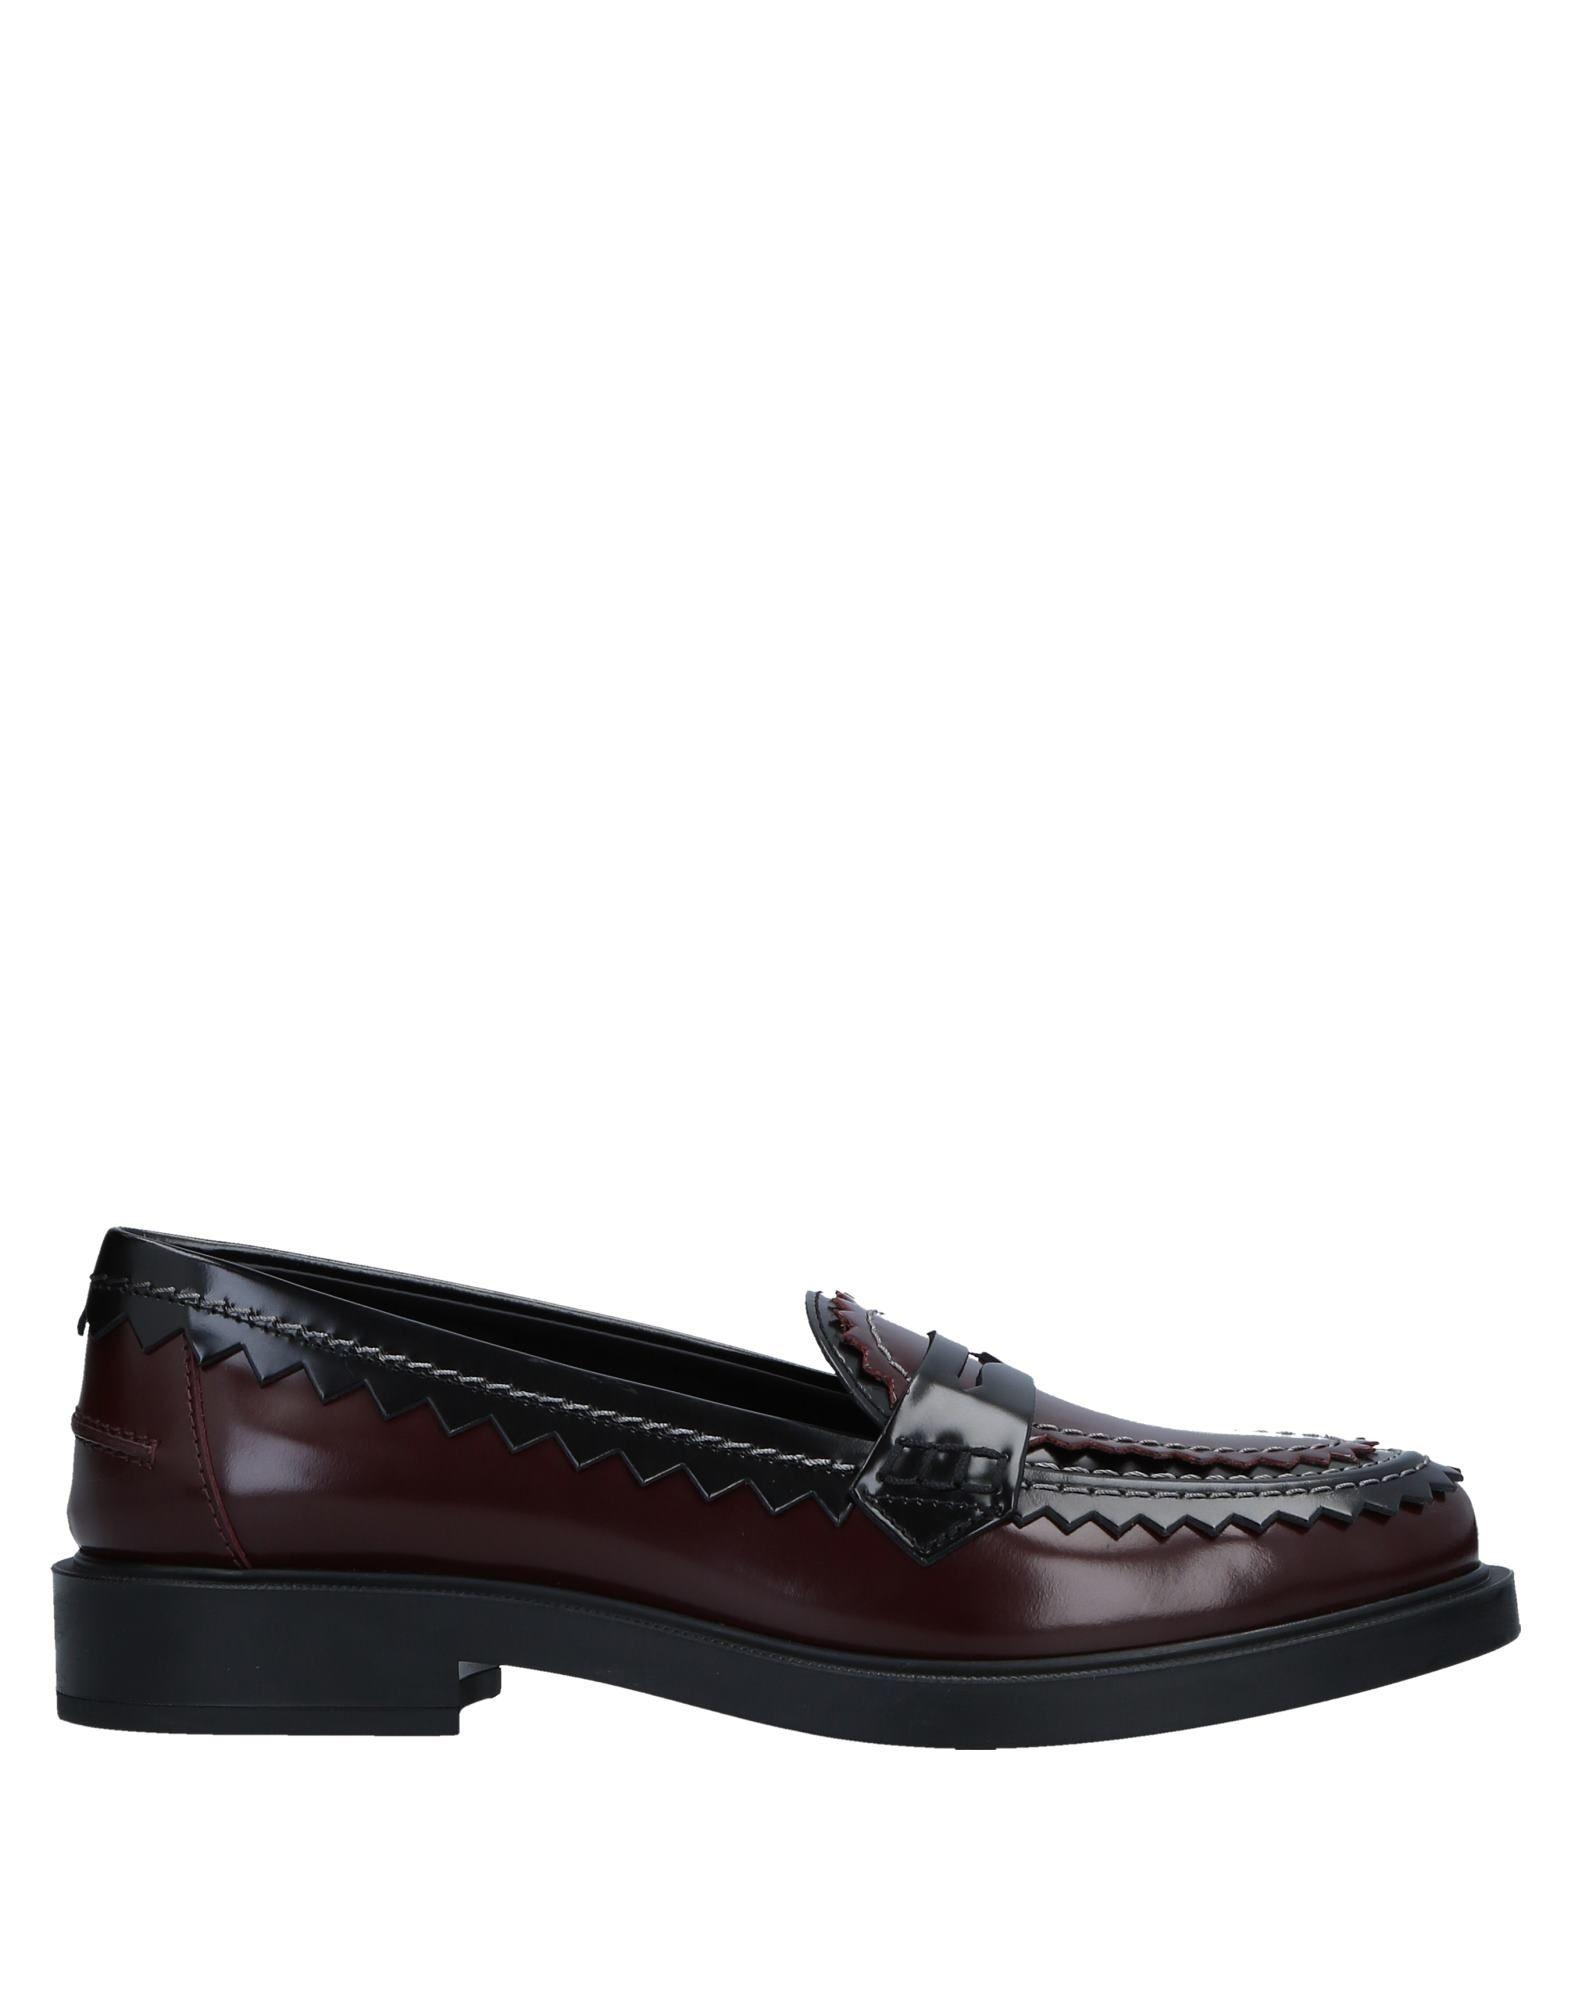 Rabatt Schuhe Tod's Mokassins Damen  11542201FI